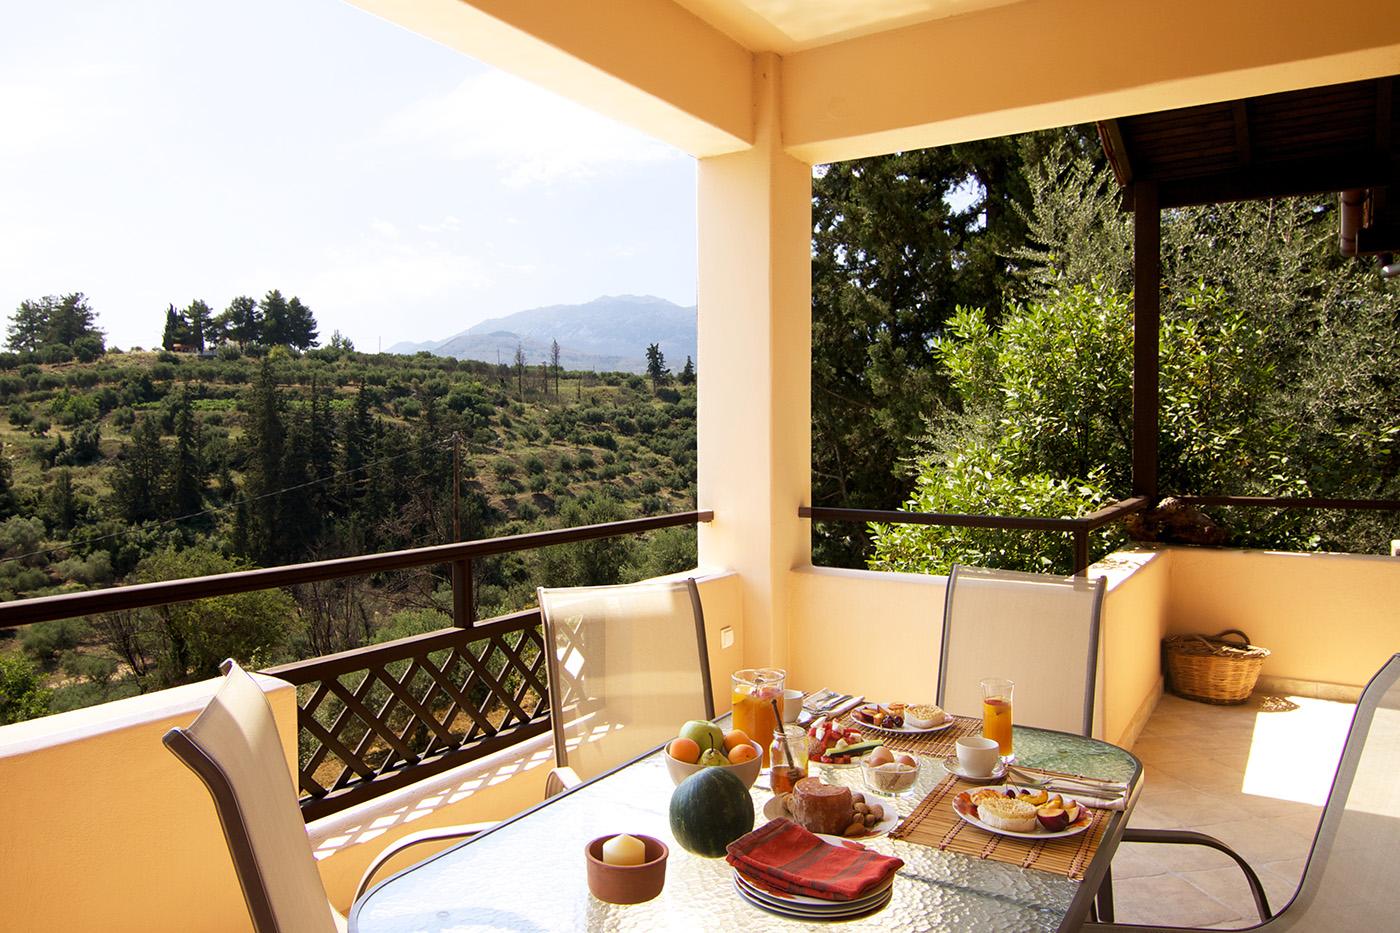 Outdoors - Panoramic view from the veranda